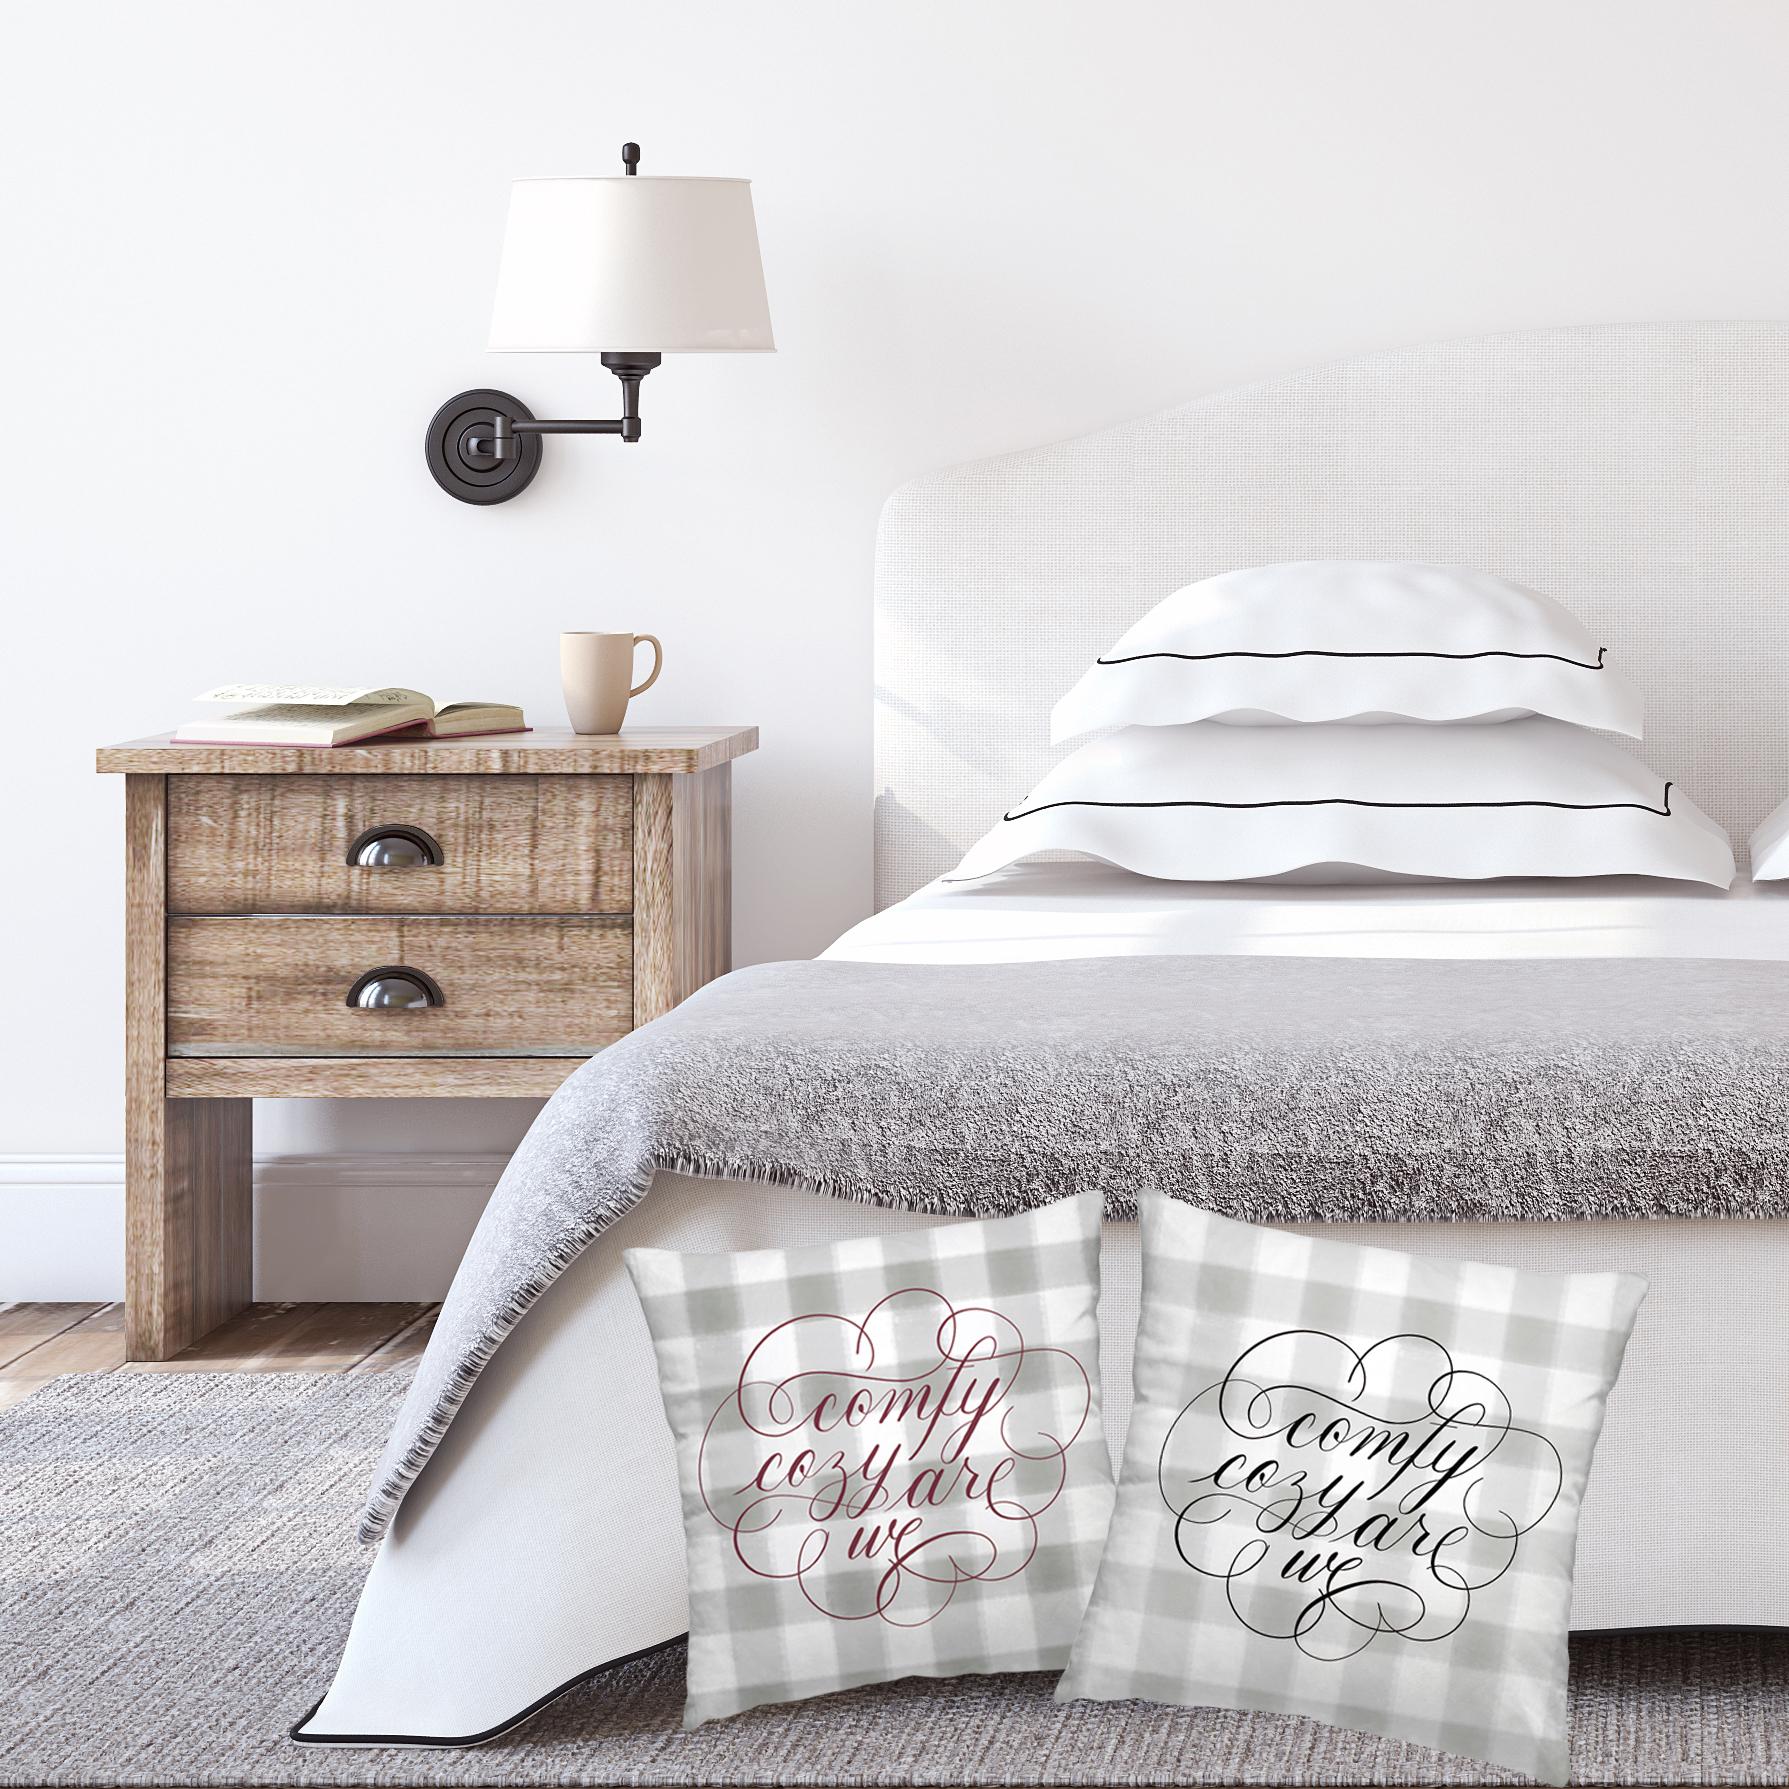 Comfy Cozy Flourished Pillow-  JesSmith Designs